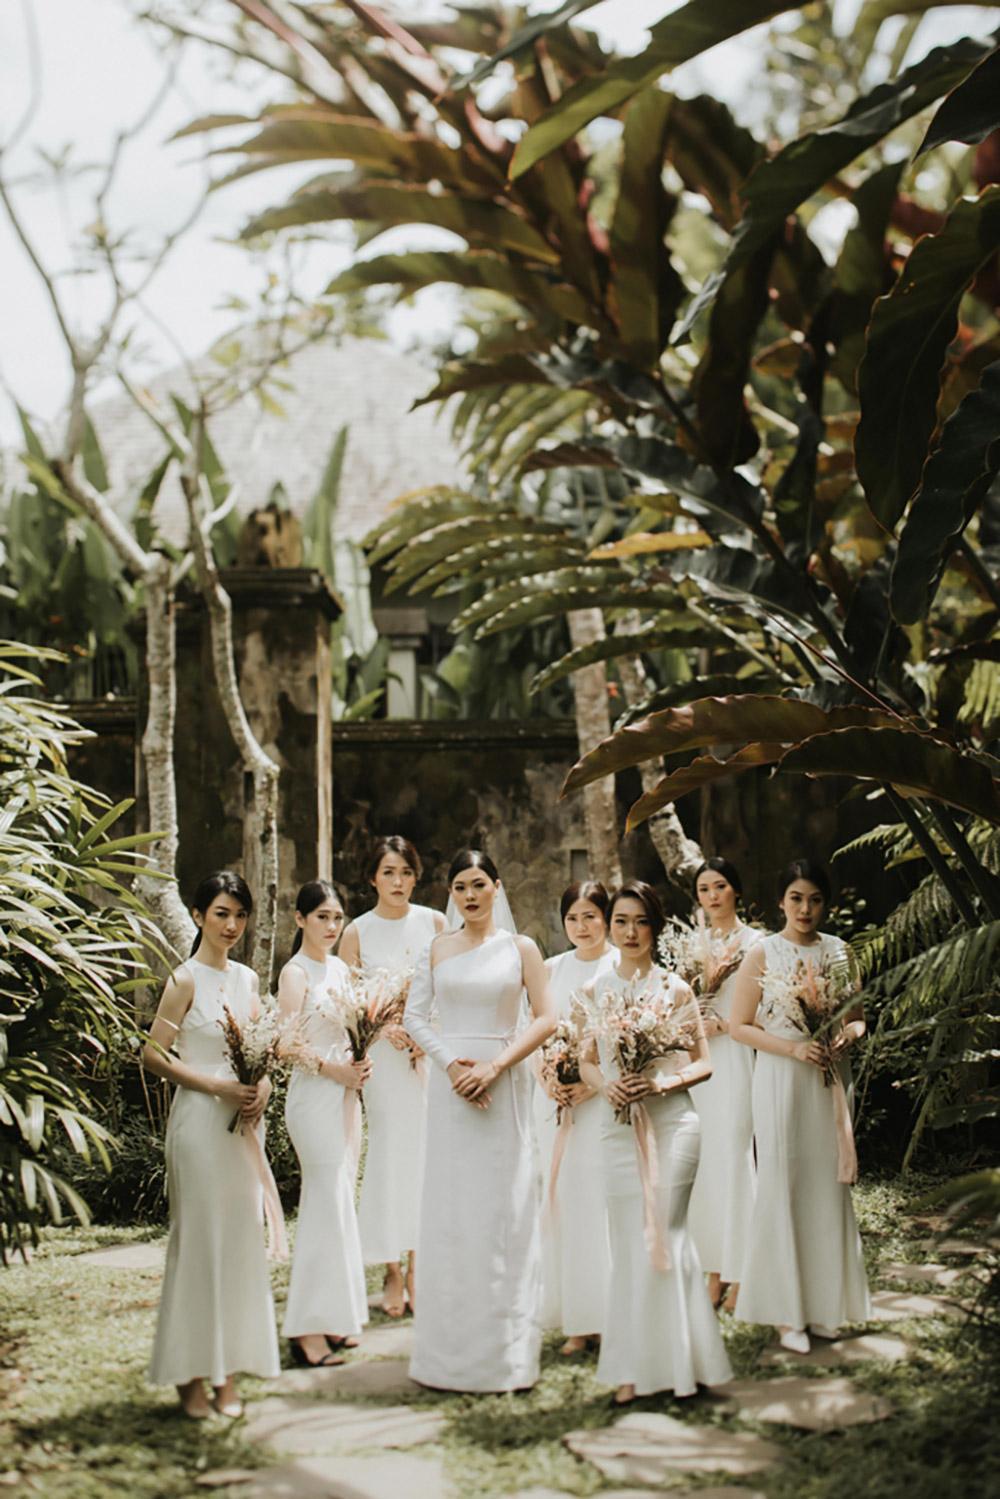 Bridesmaids in all white. Photo by Iluminen. www.theweddingnotebook.com